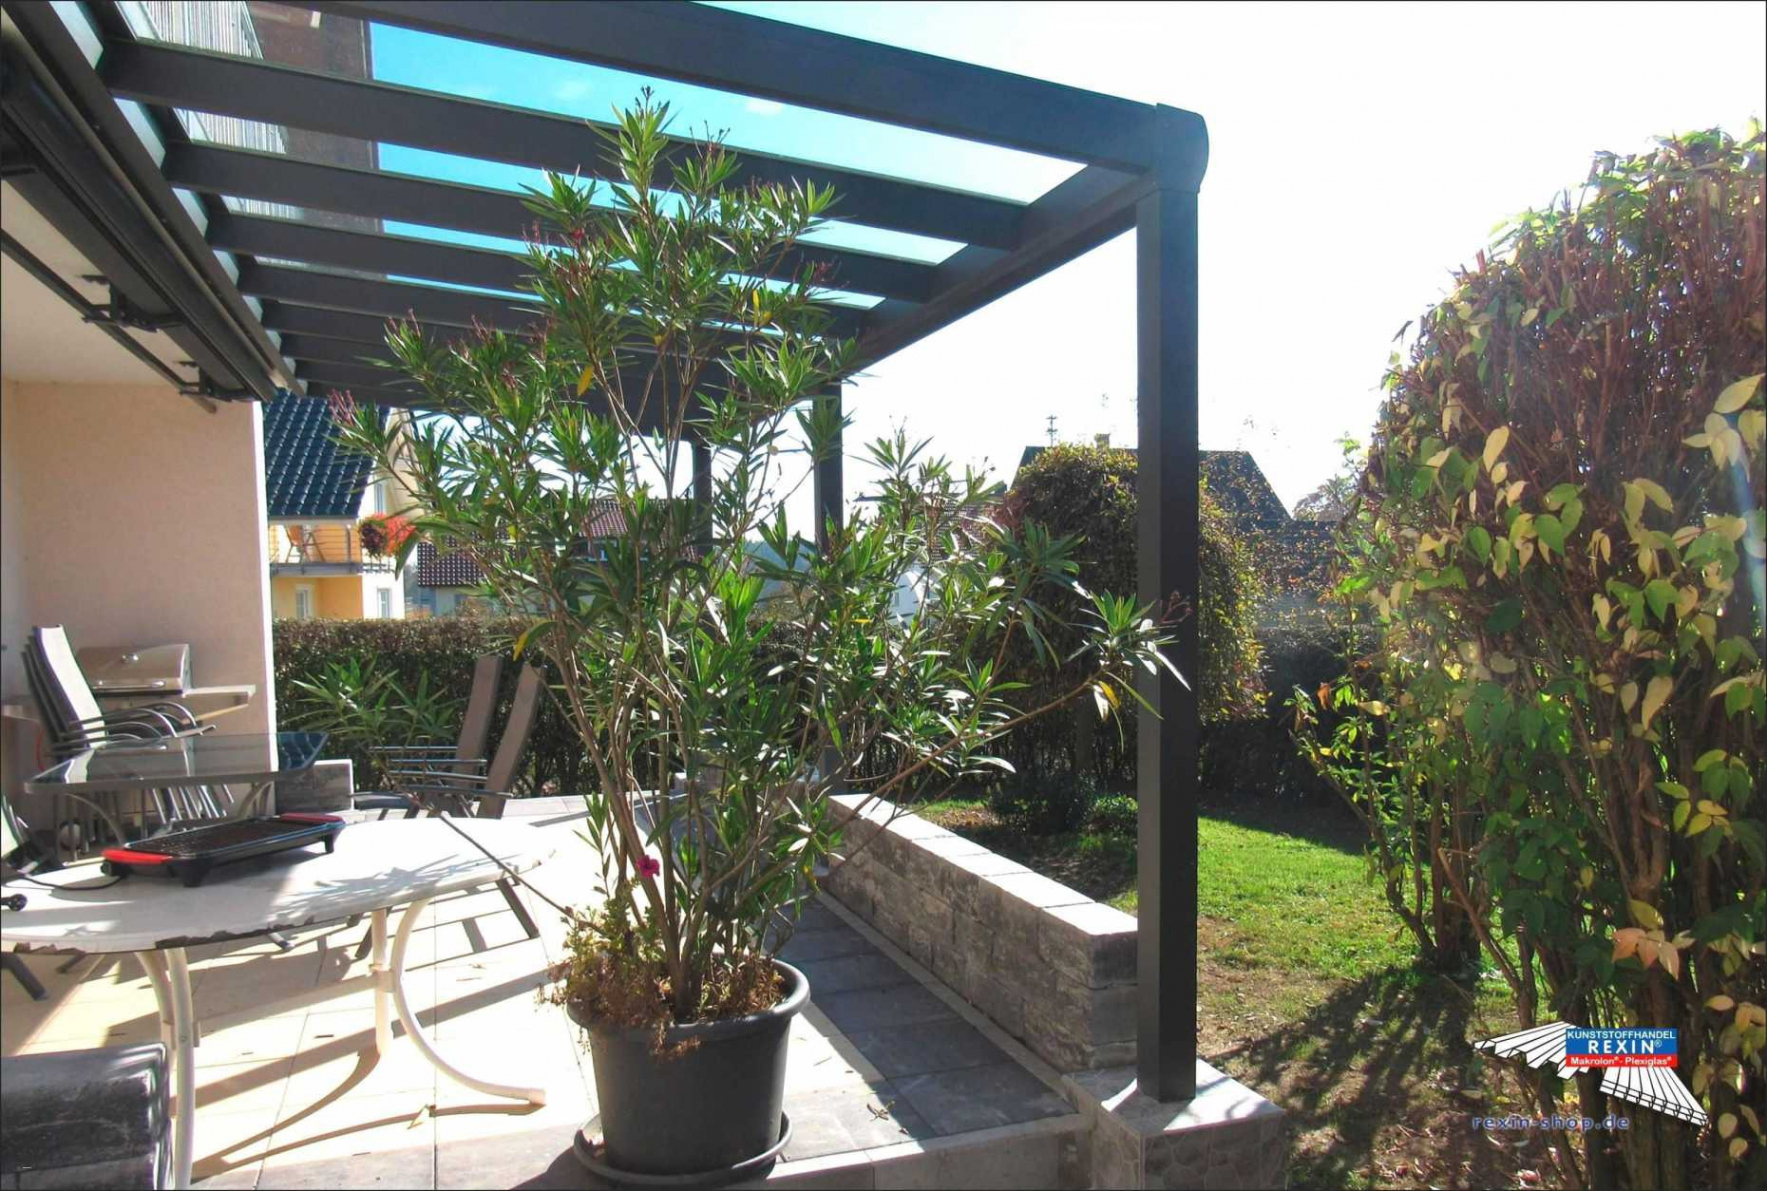 Bambus Deko Garten Luxus Grillplatz Im Garten — Temobardz Home Blog